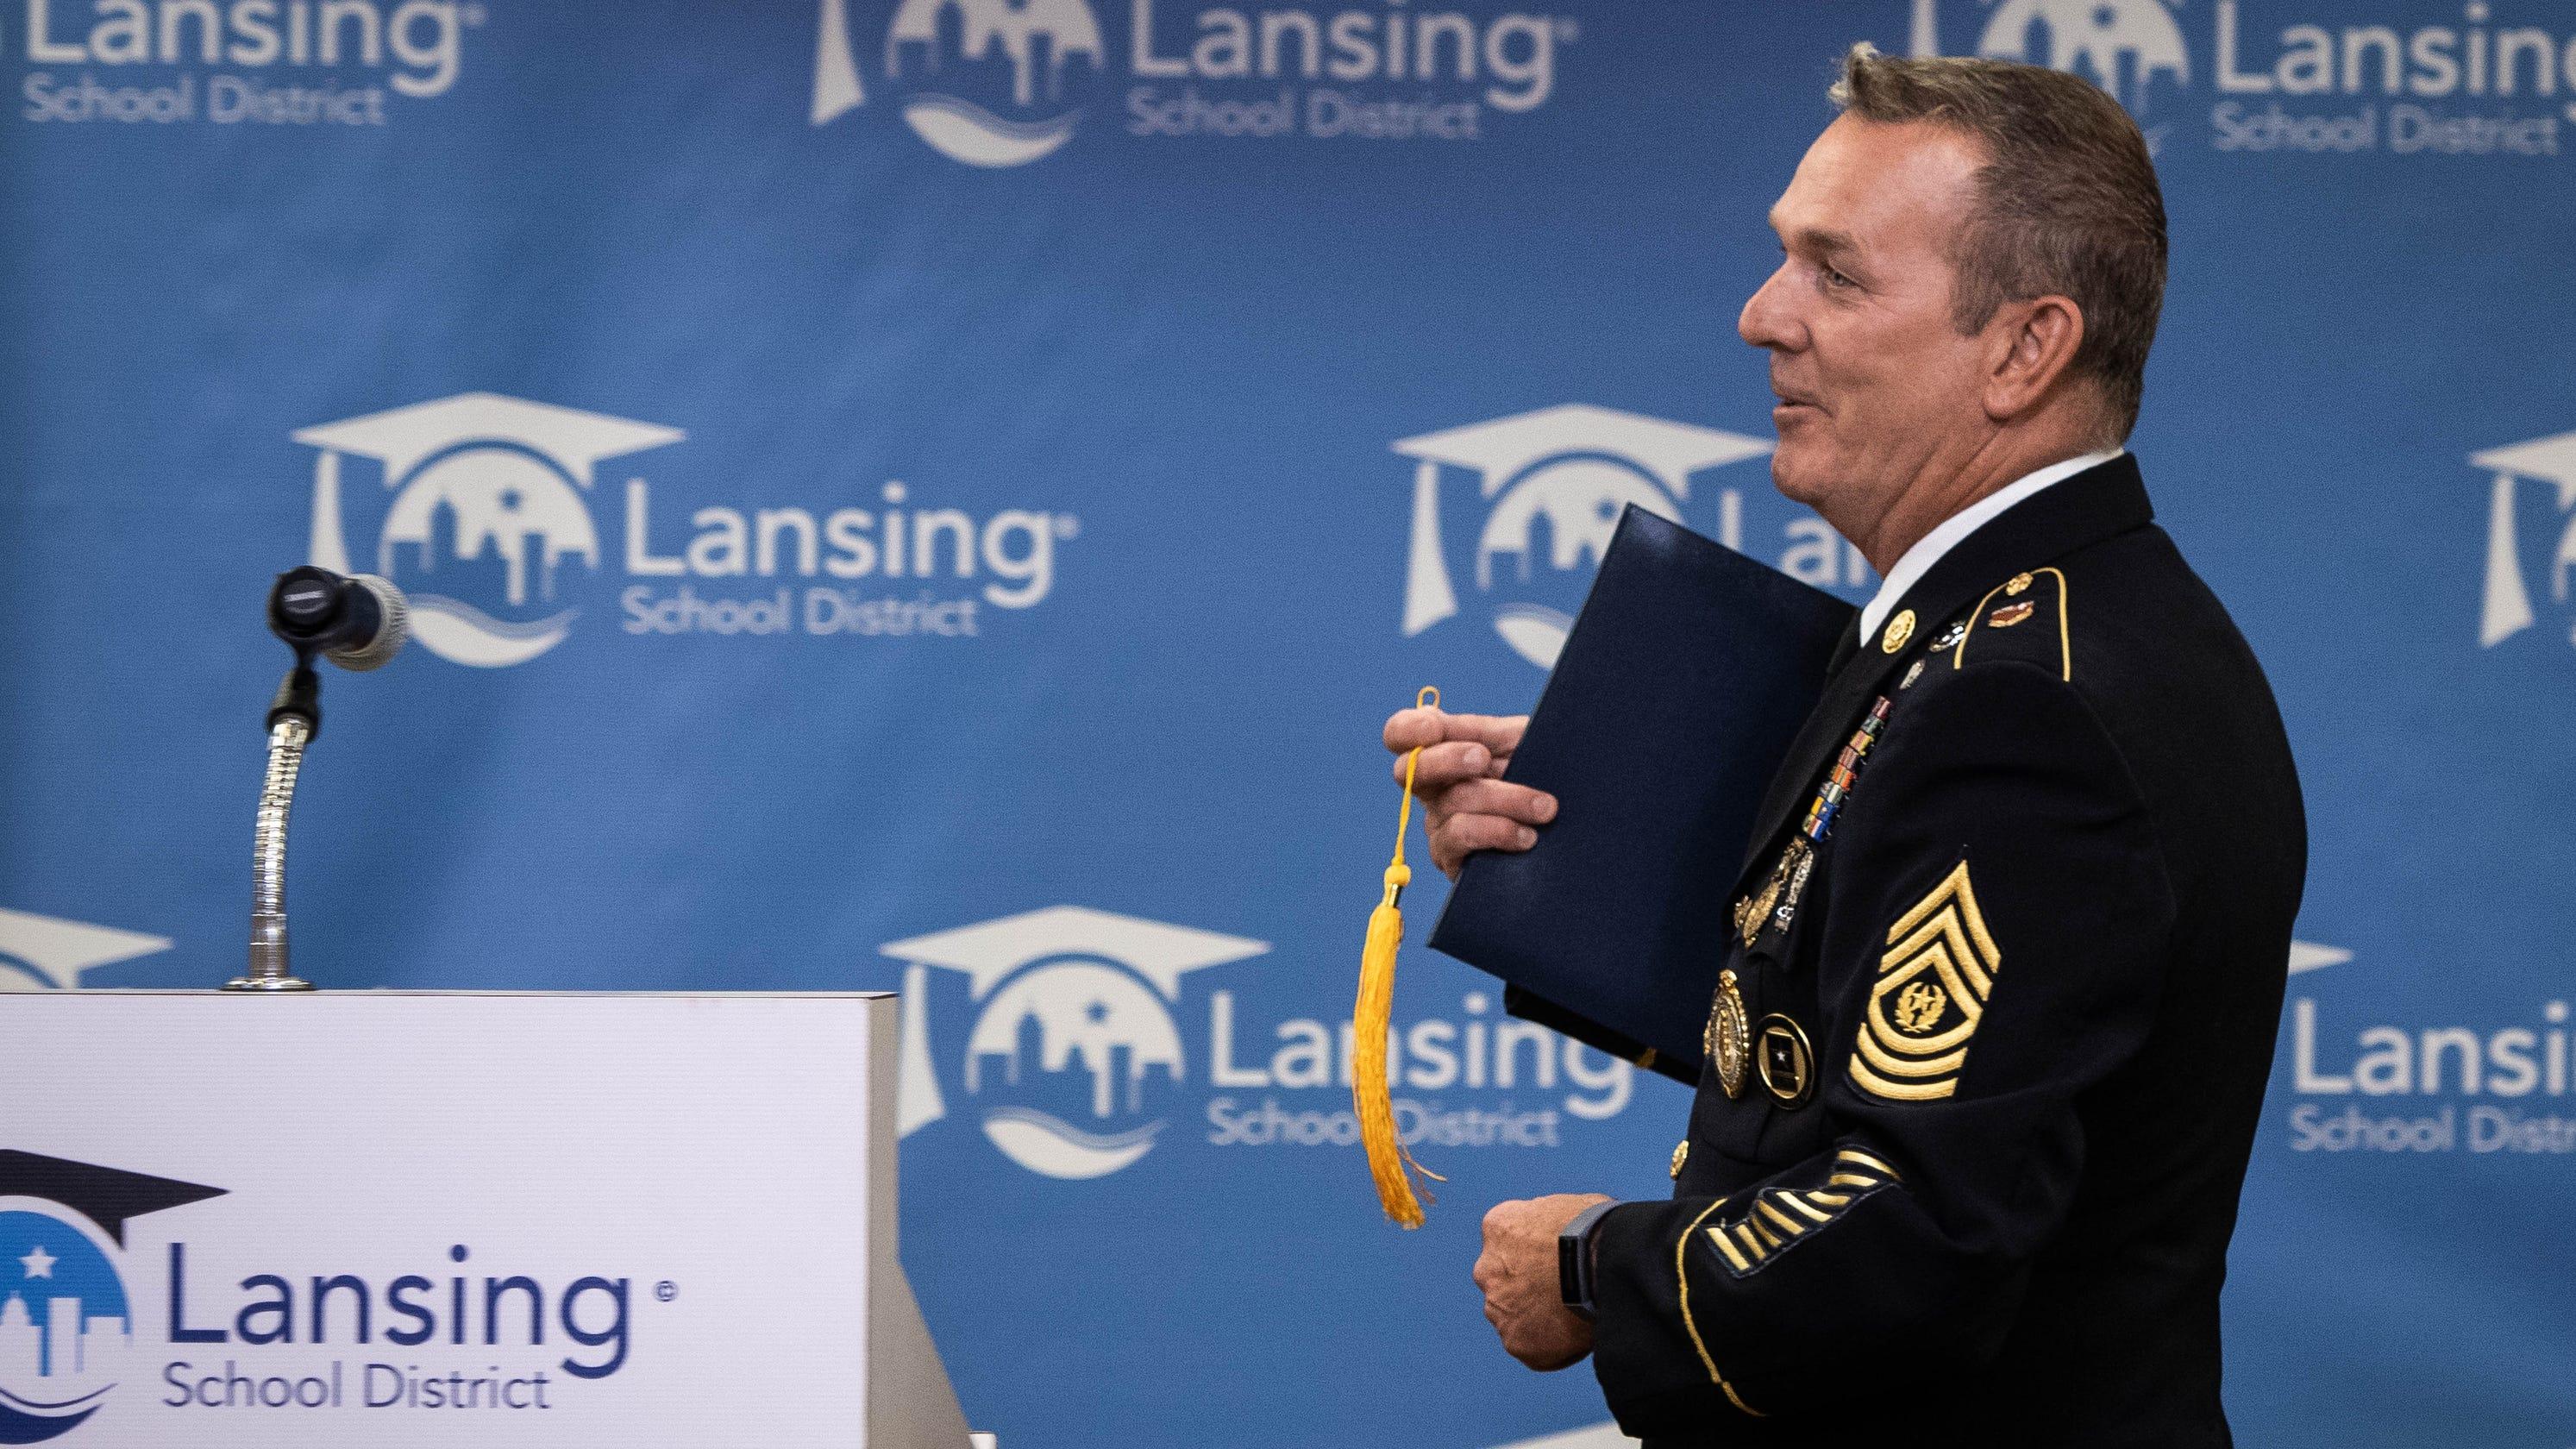 Grand Ledge man gets Lansing Eastern High School diploma 45